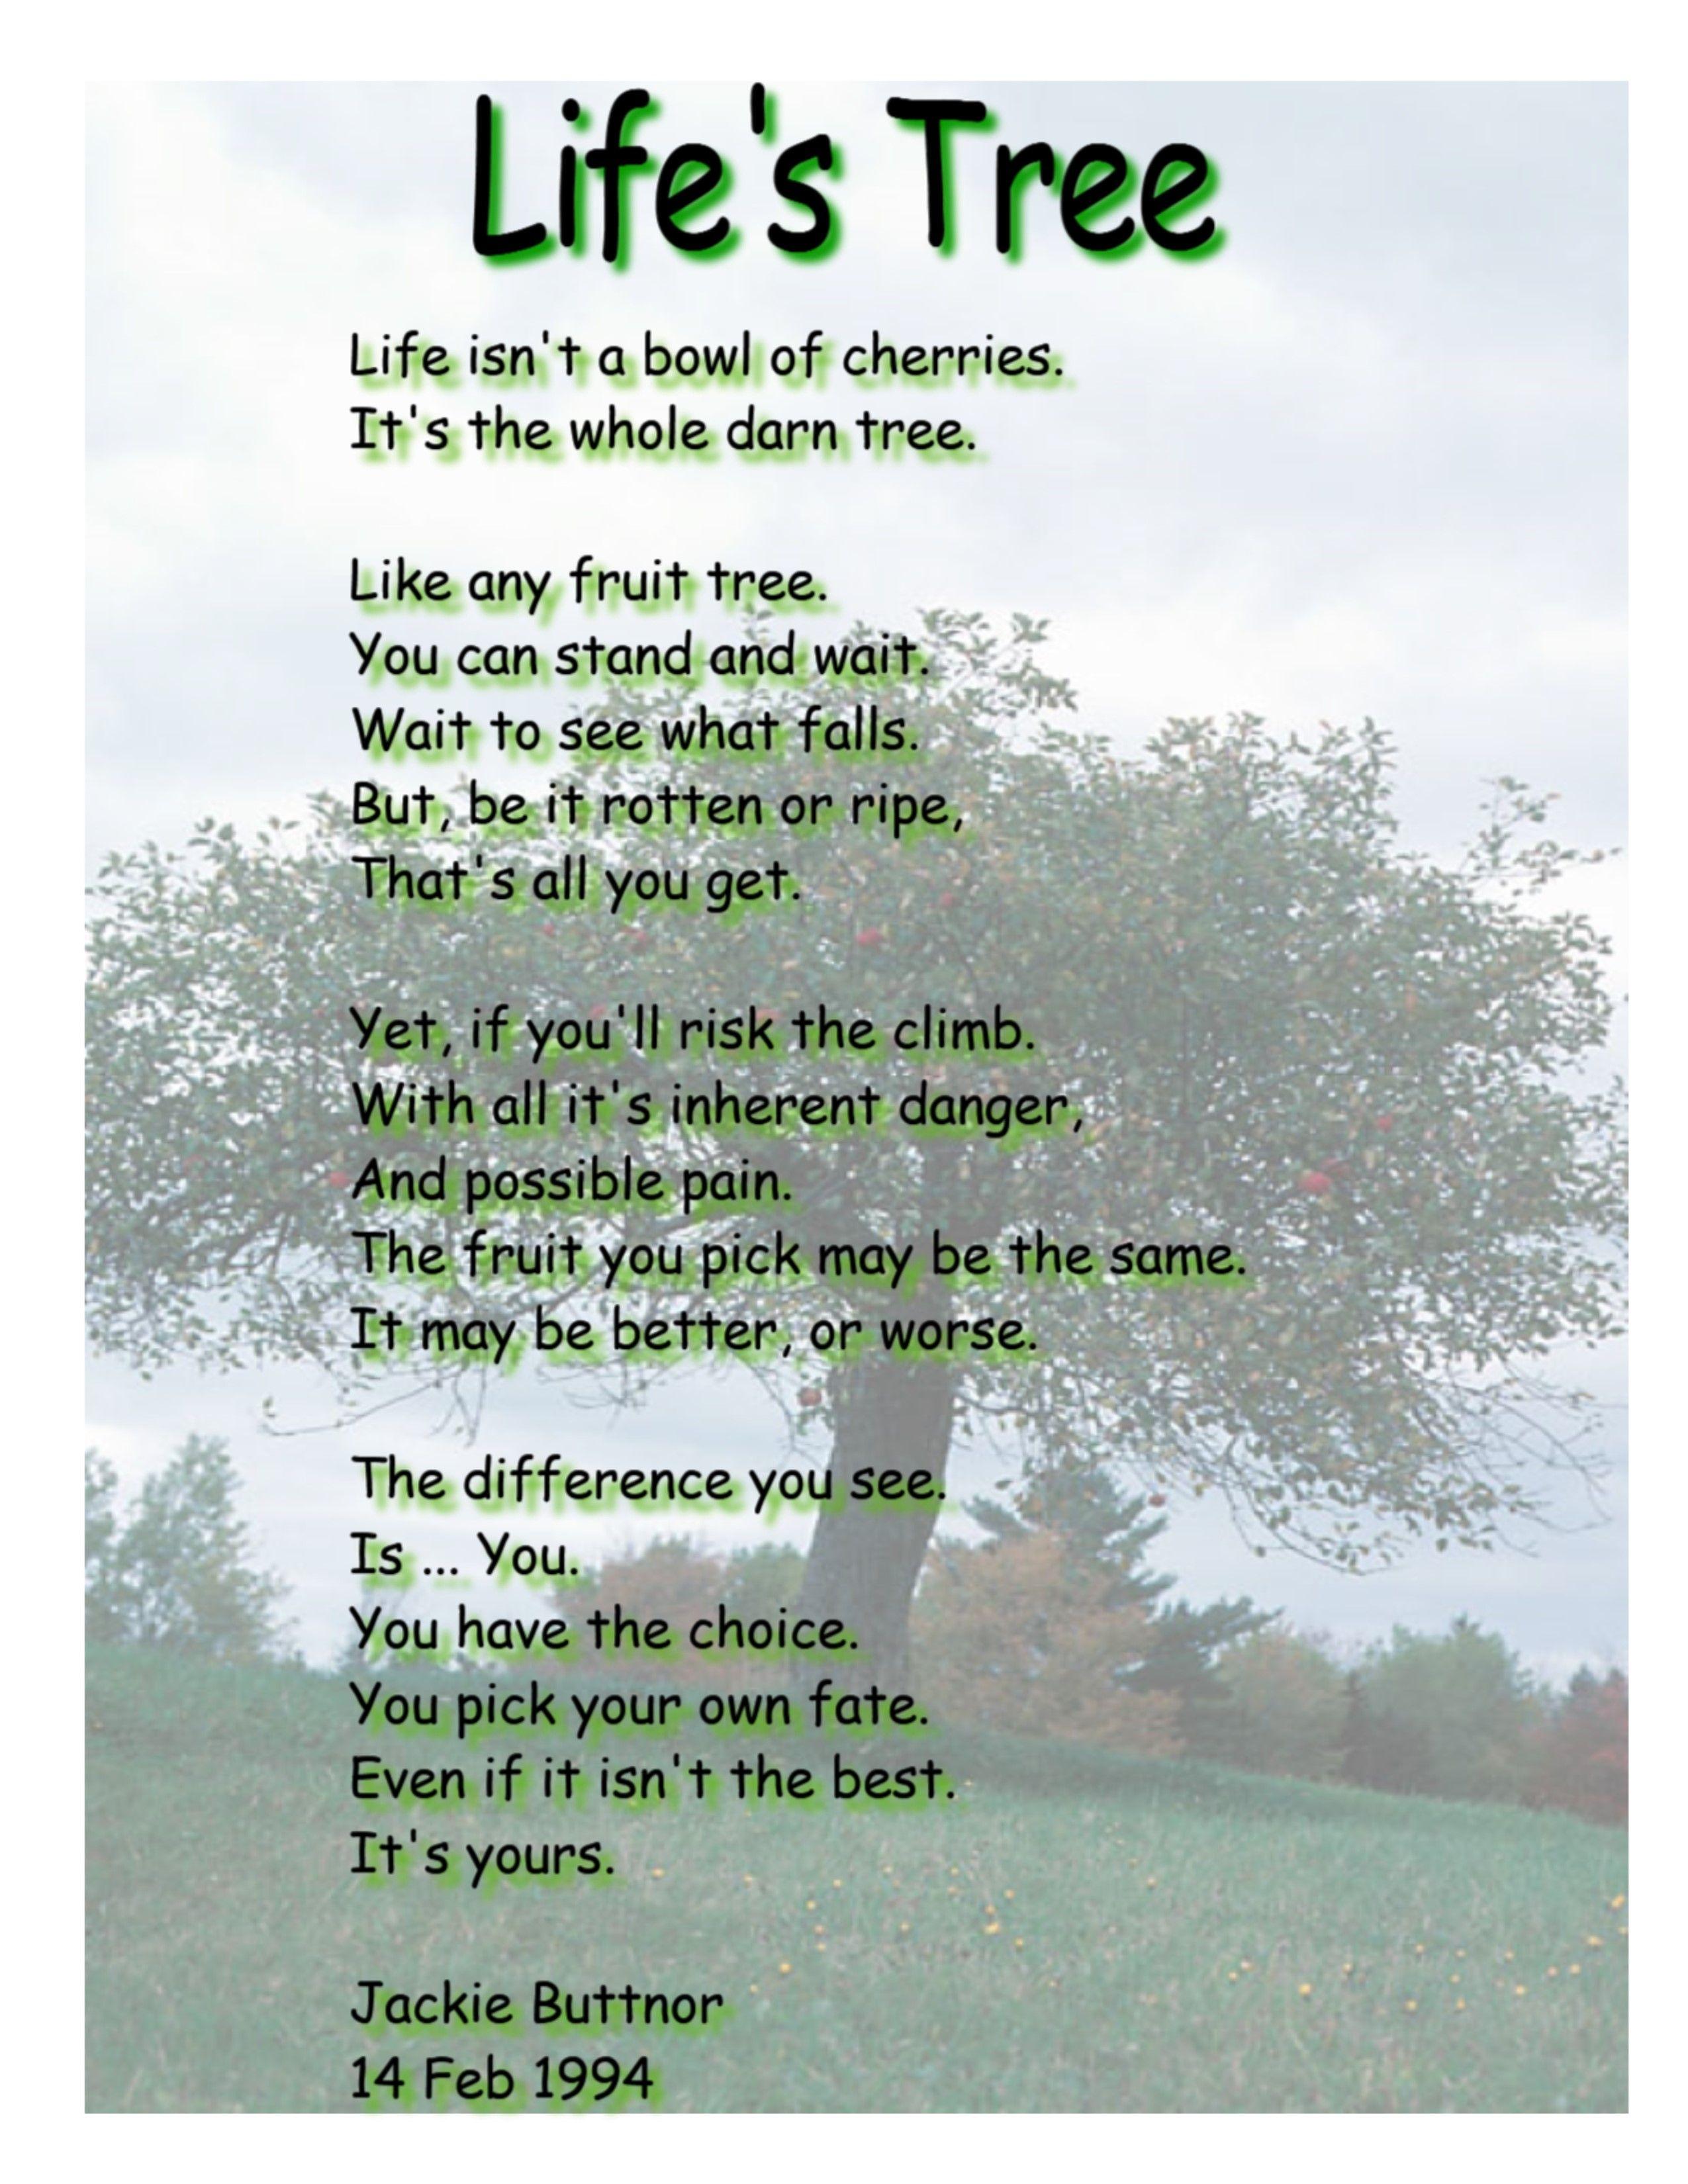 Life's Tree